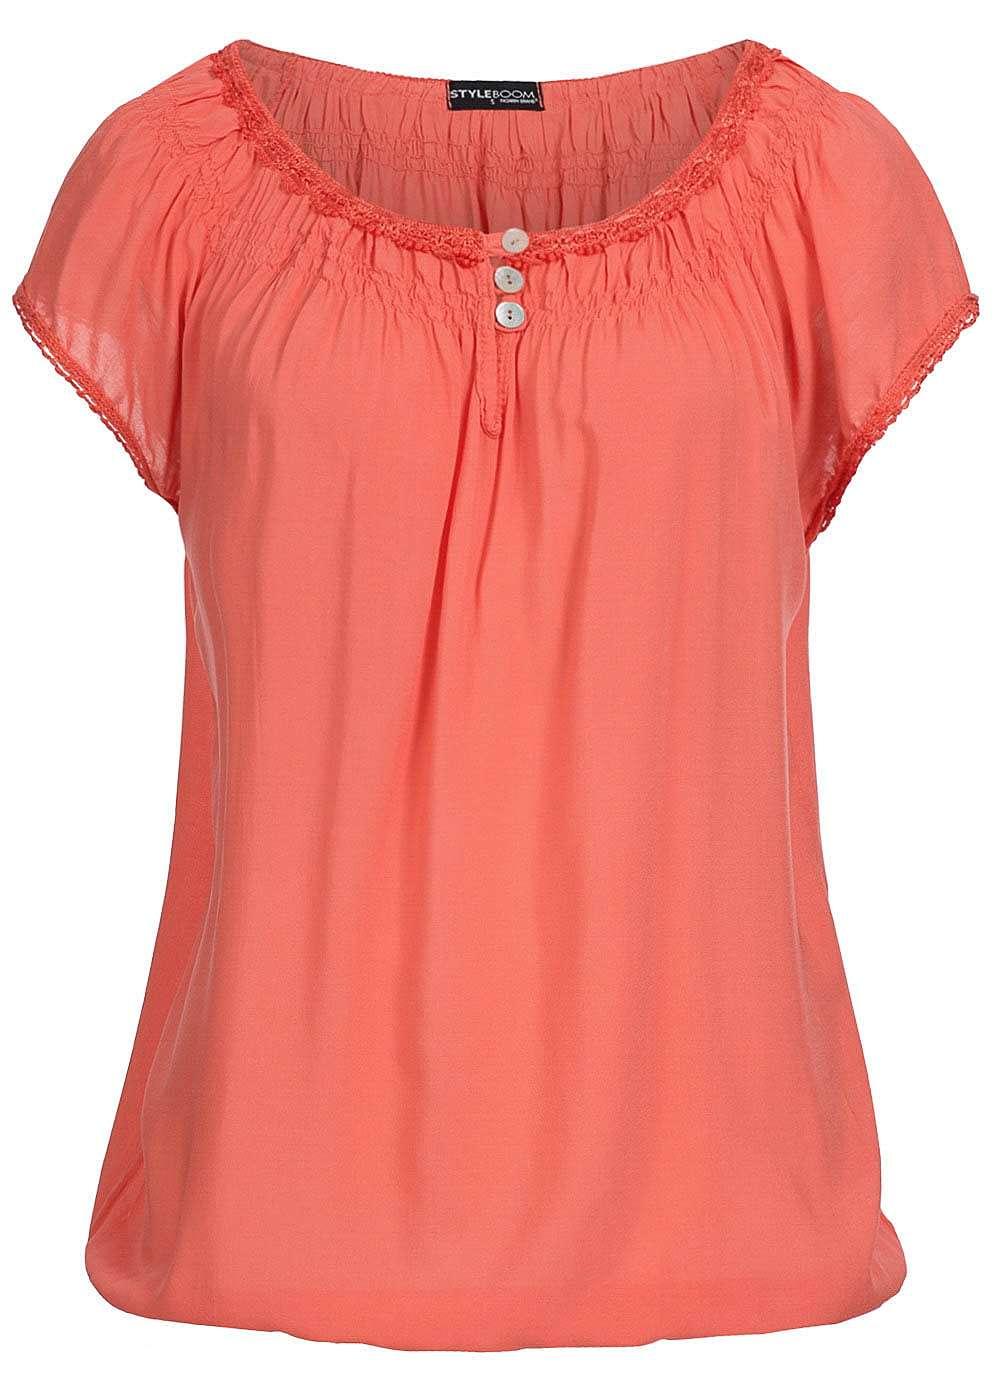 styleboom fashion damen shirt gummizug am saum 3 kn pfe coral orange 77onlineshop. Black Bedroom Furniture Sets. Home Design Ideas